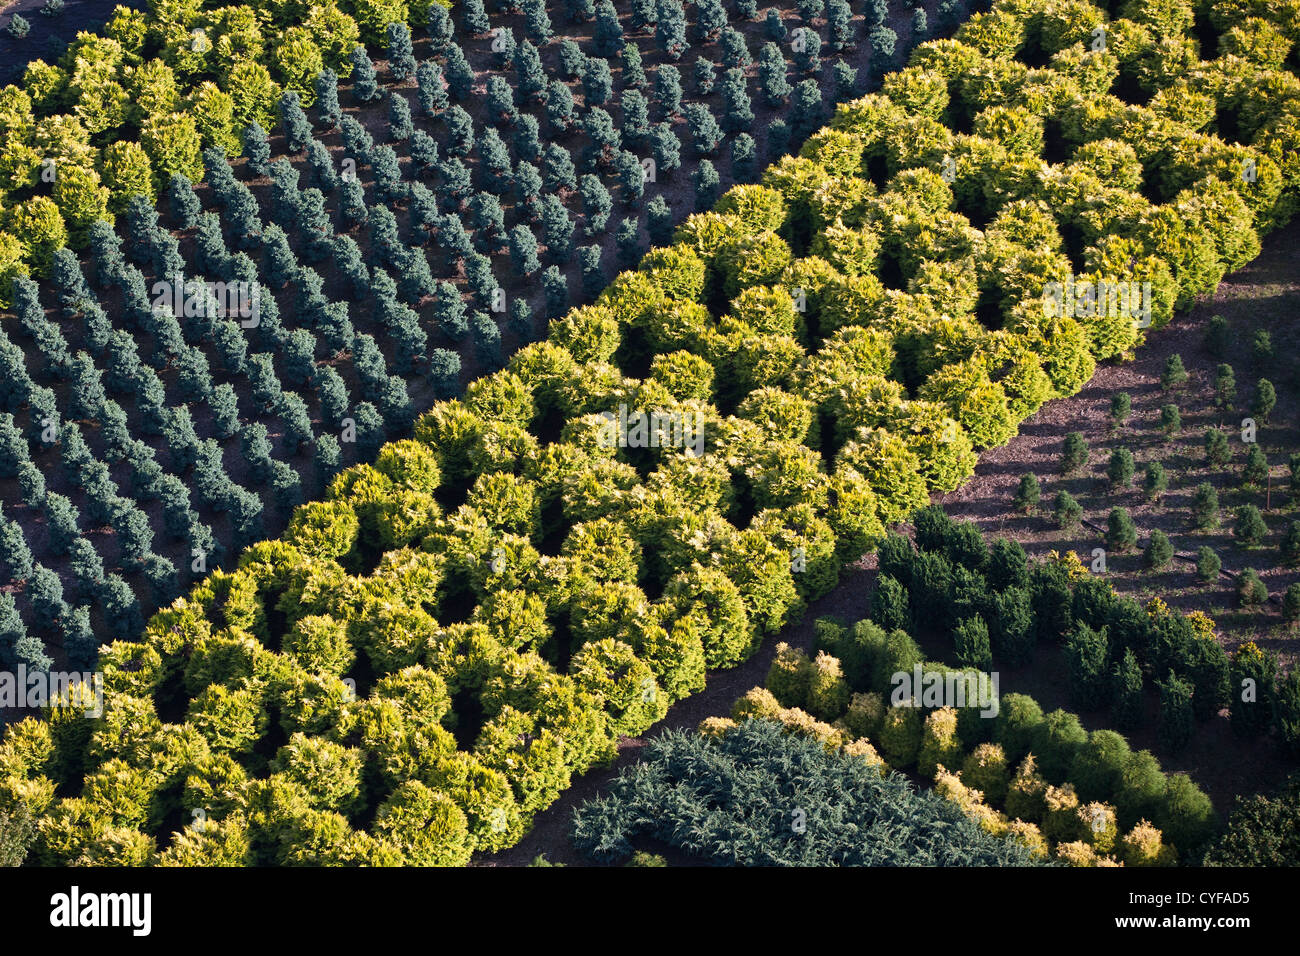 The Netherlands, Loosdrecht, Horticulture. Aerial. - Stock Image